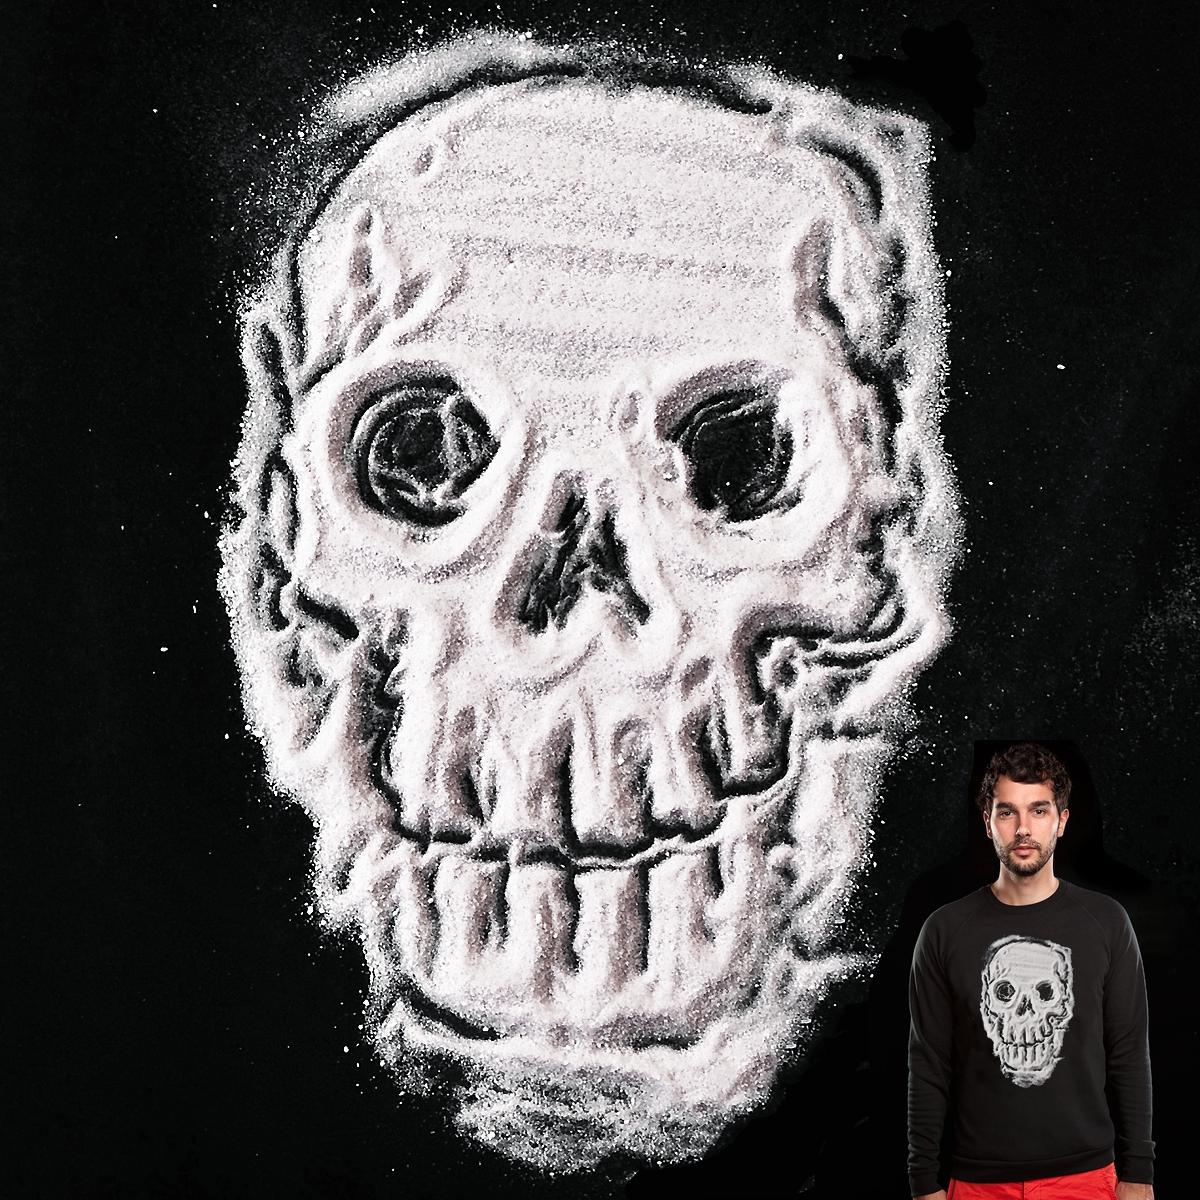 Sugar Skull by jeffreyg and alexmdc on Threadless